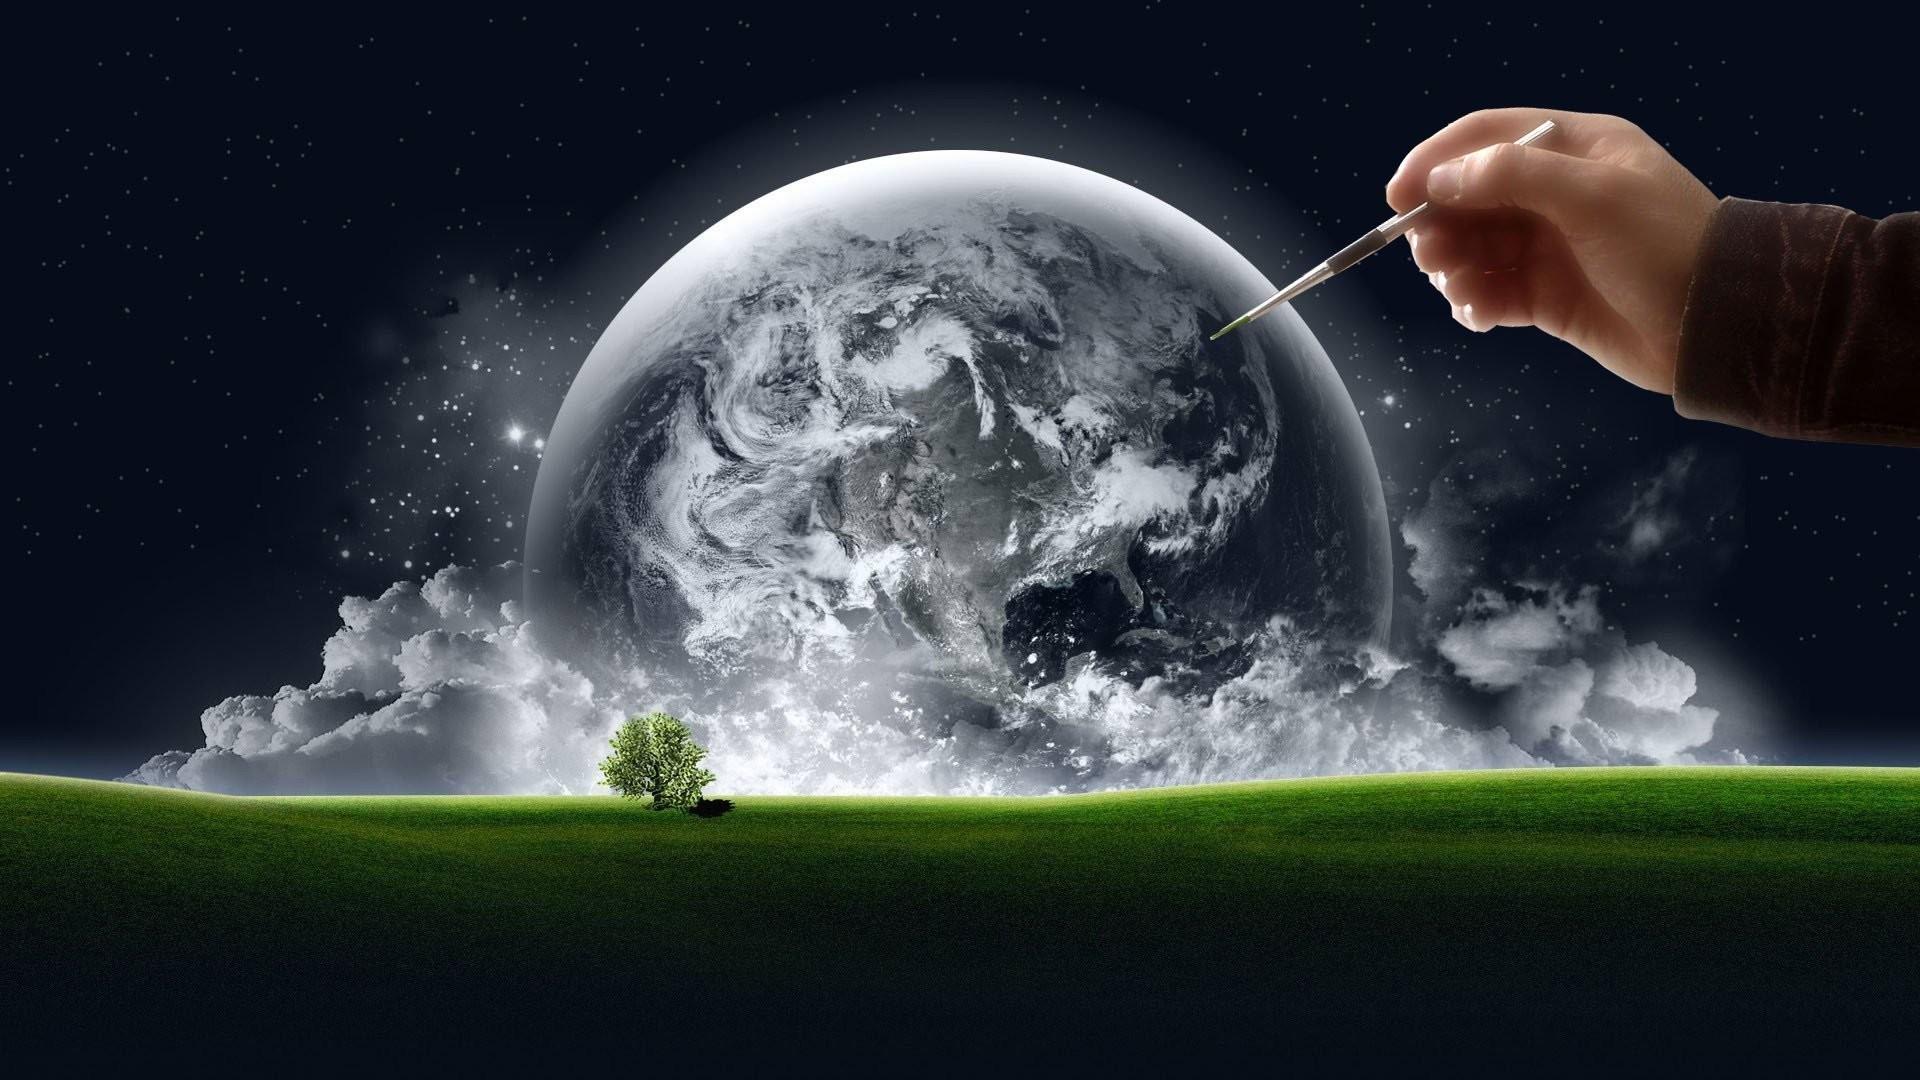 Clouds, Smart Phones Ios, Trees, Desktop Wallpapers, - Nature Space Wallpaper Hd , HD Wallpaper & Backgrounds